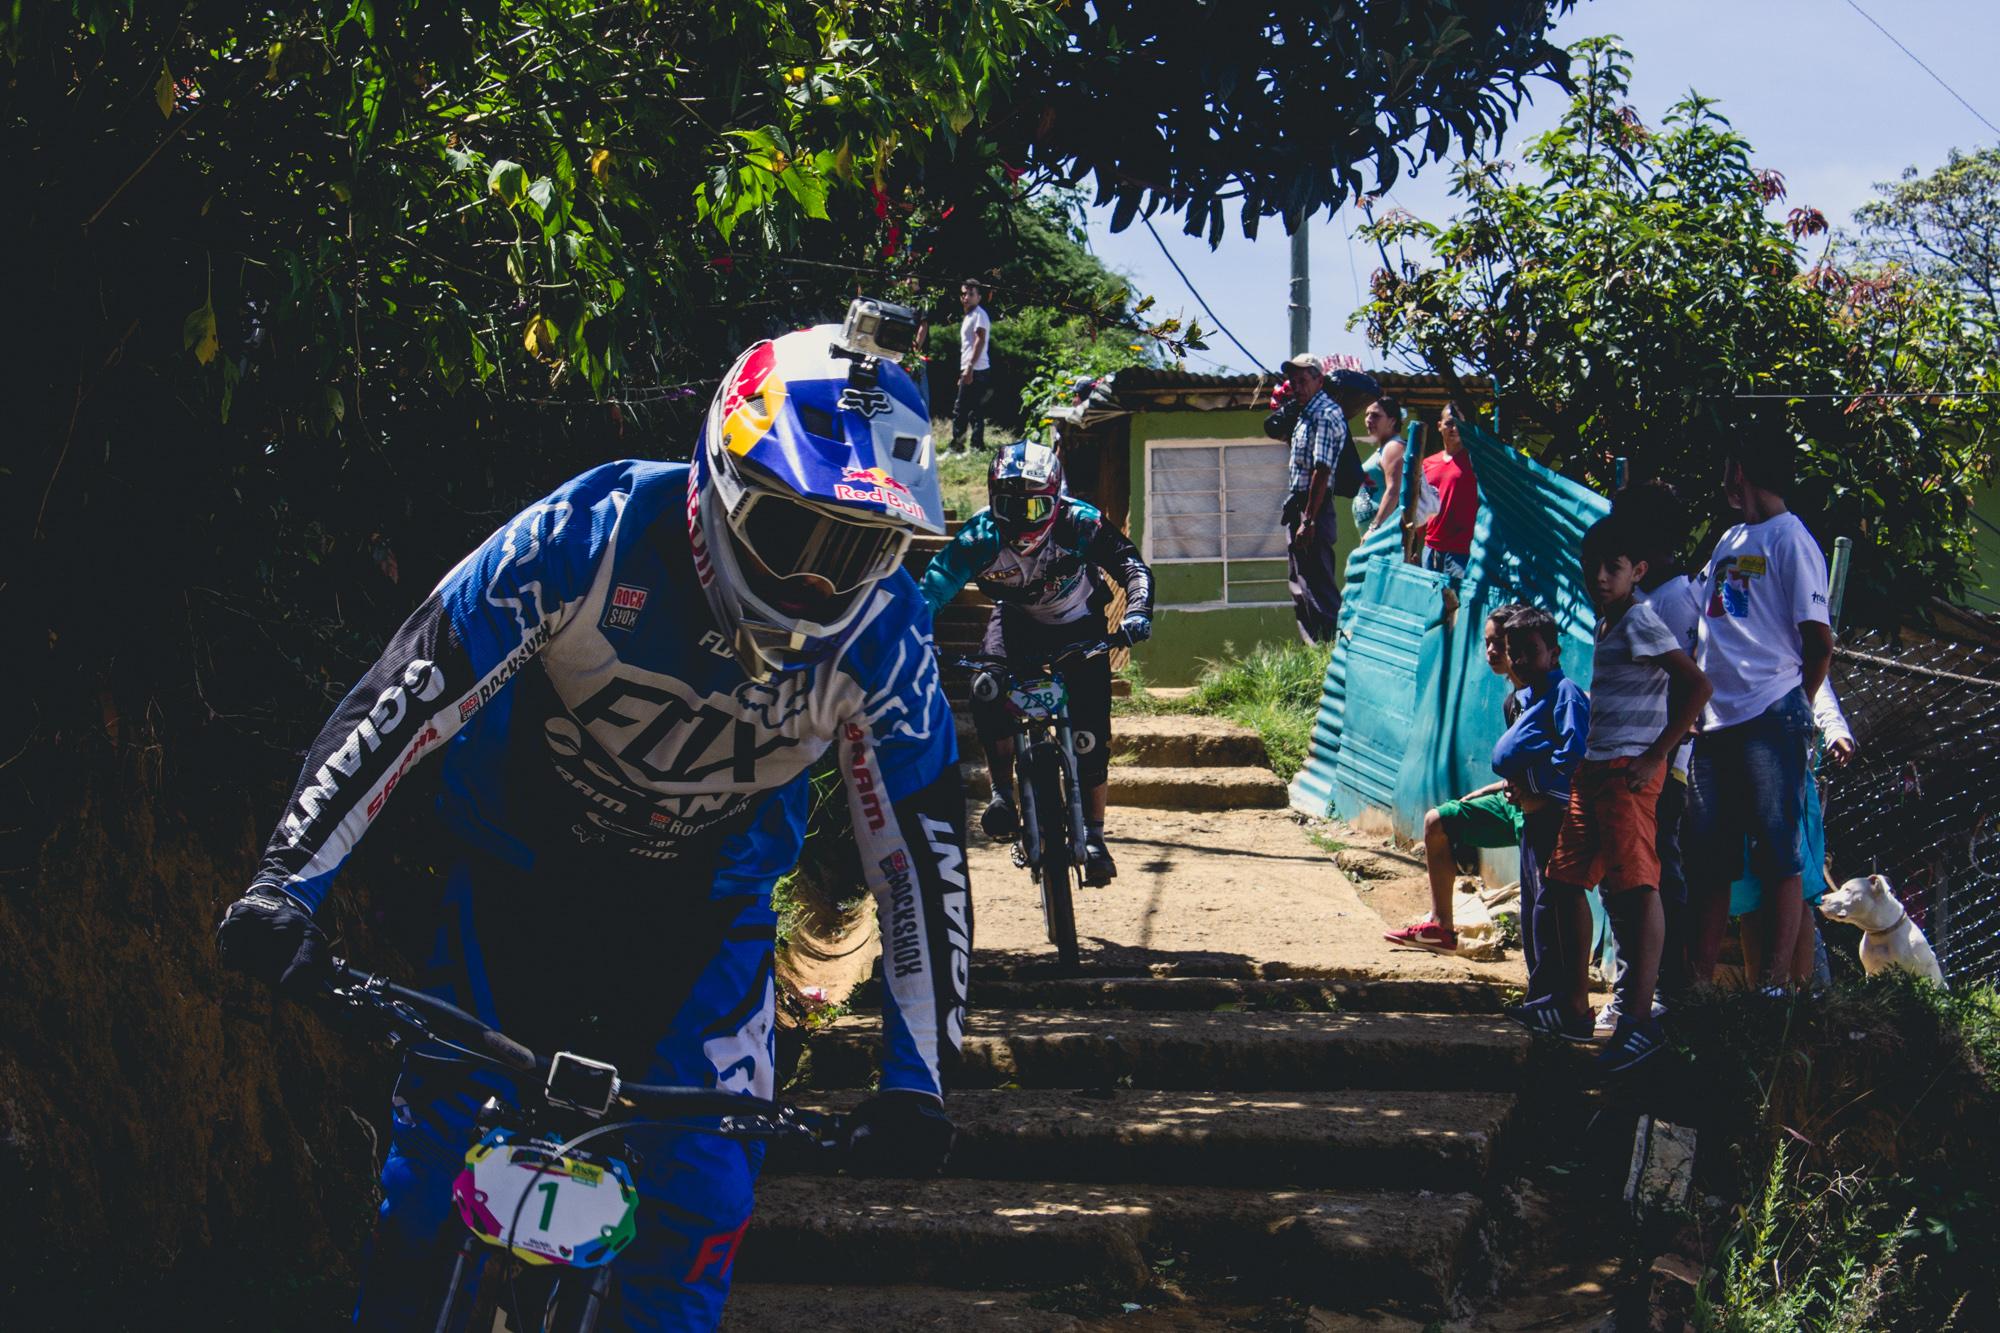 Daunjilero_Adrenalina_Urban_Daniel_Ortega-3